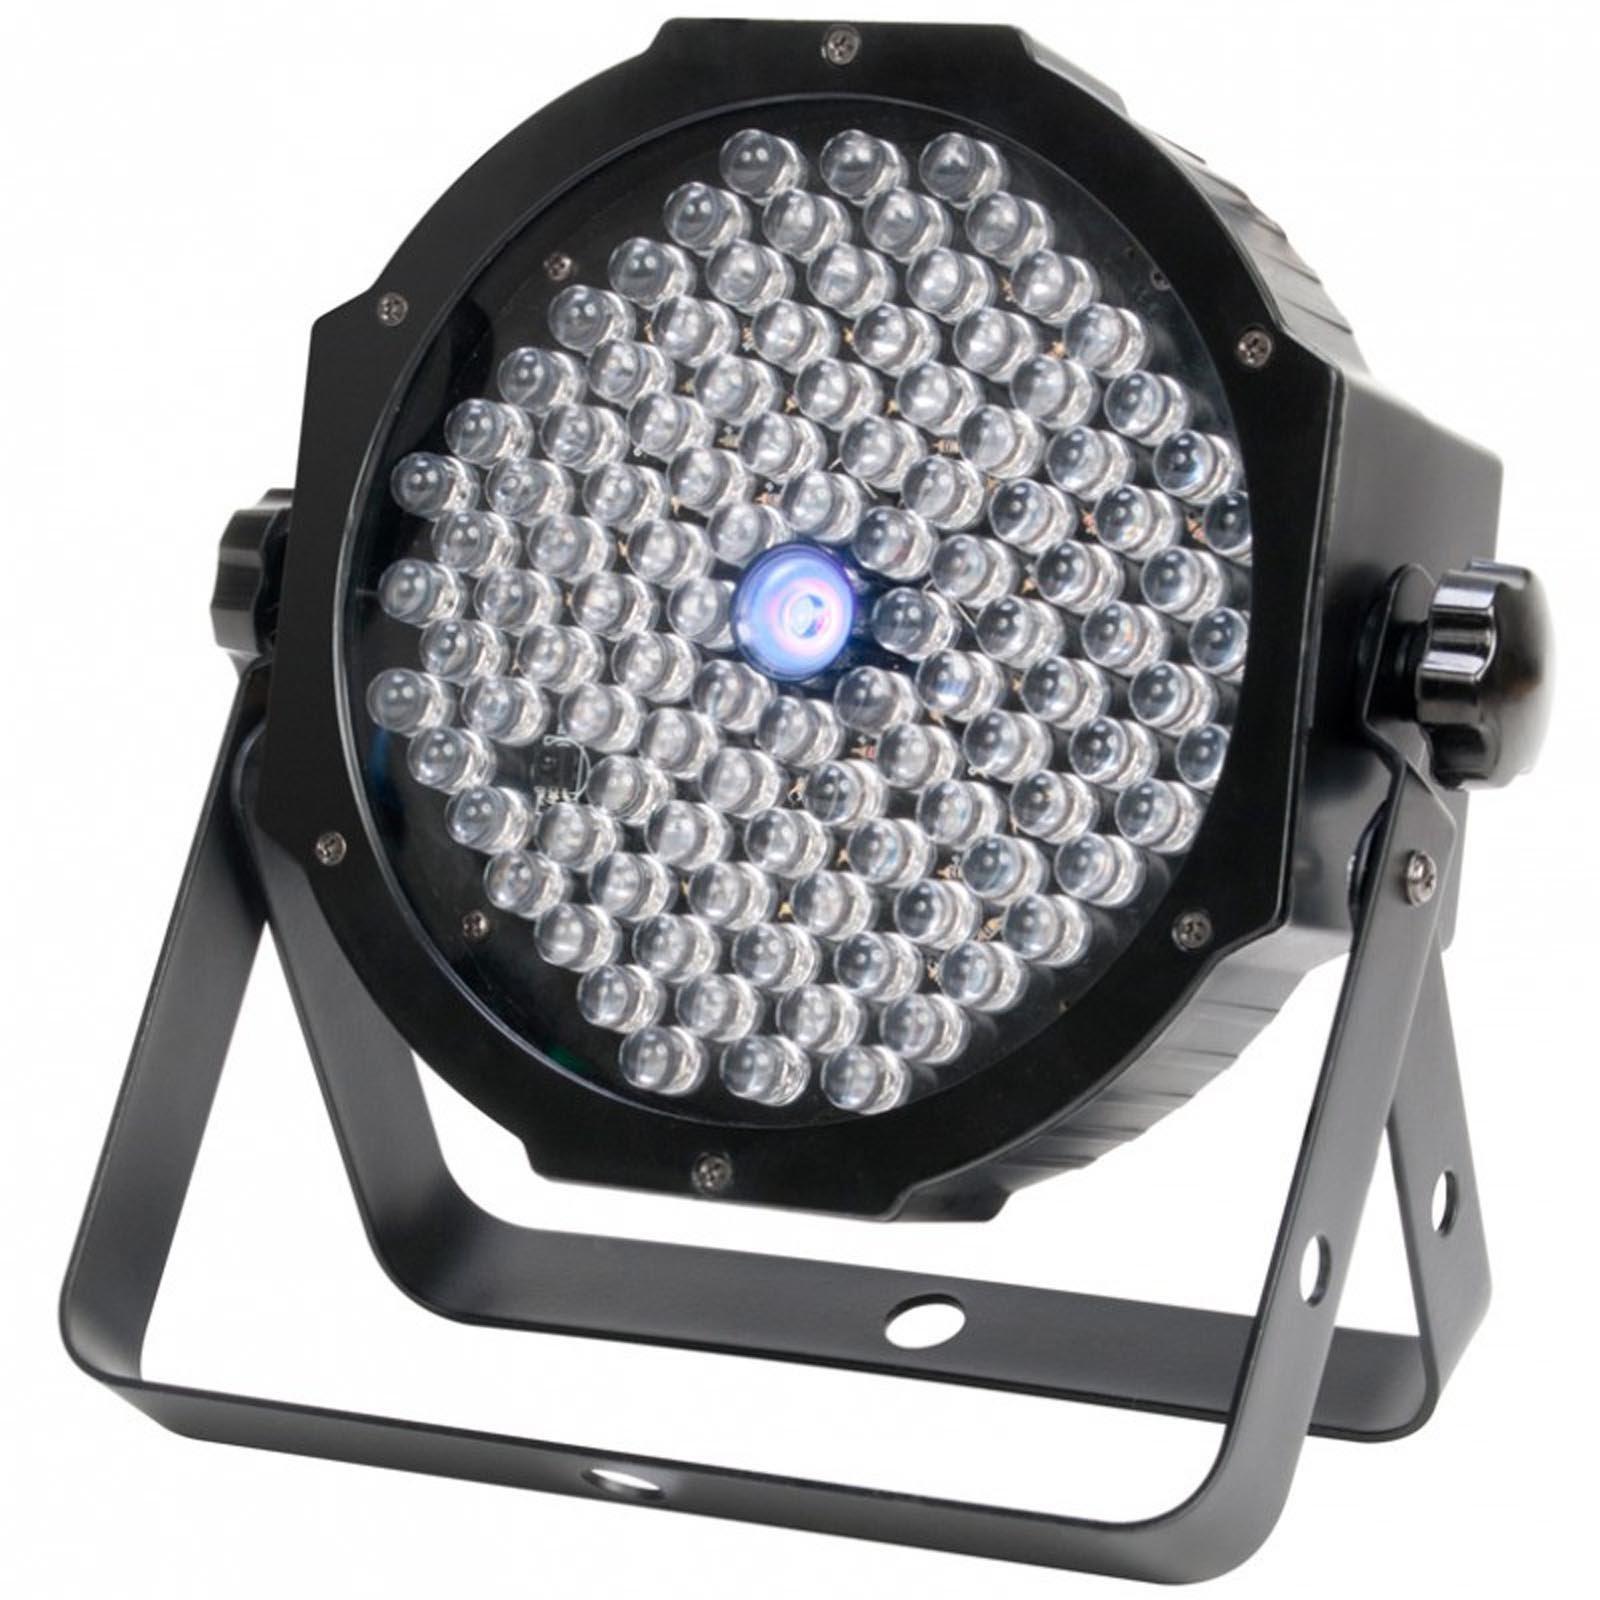 American DJ ADJ Mega Par Profile Plus LED RGB+UV Slim Par Can Wash Effect Light (6 Pack) by ADJ (Image #6)